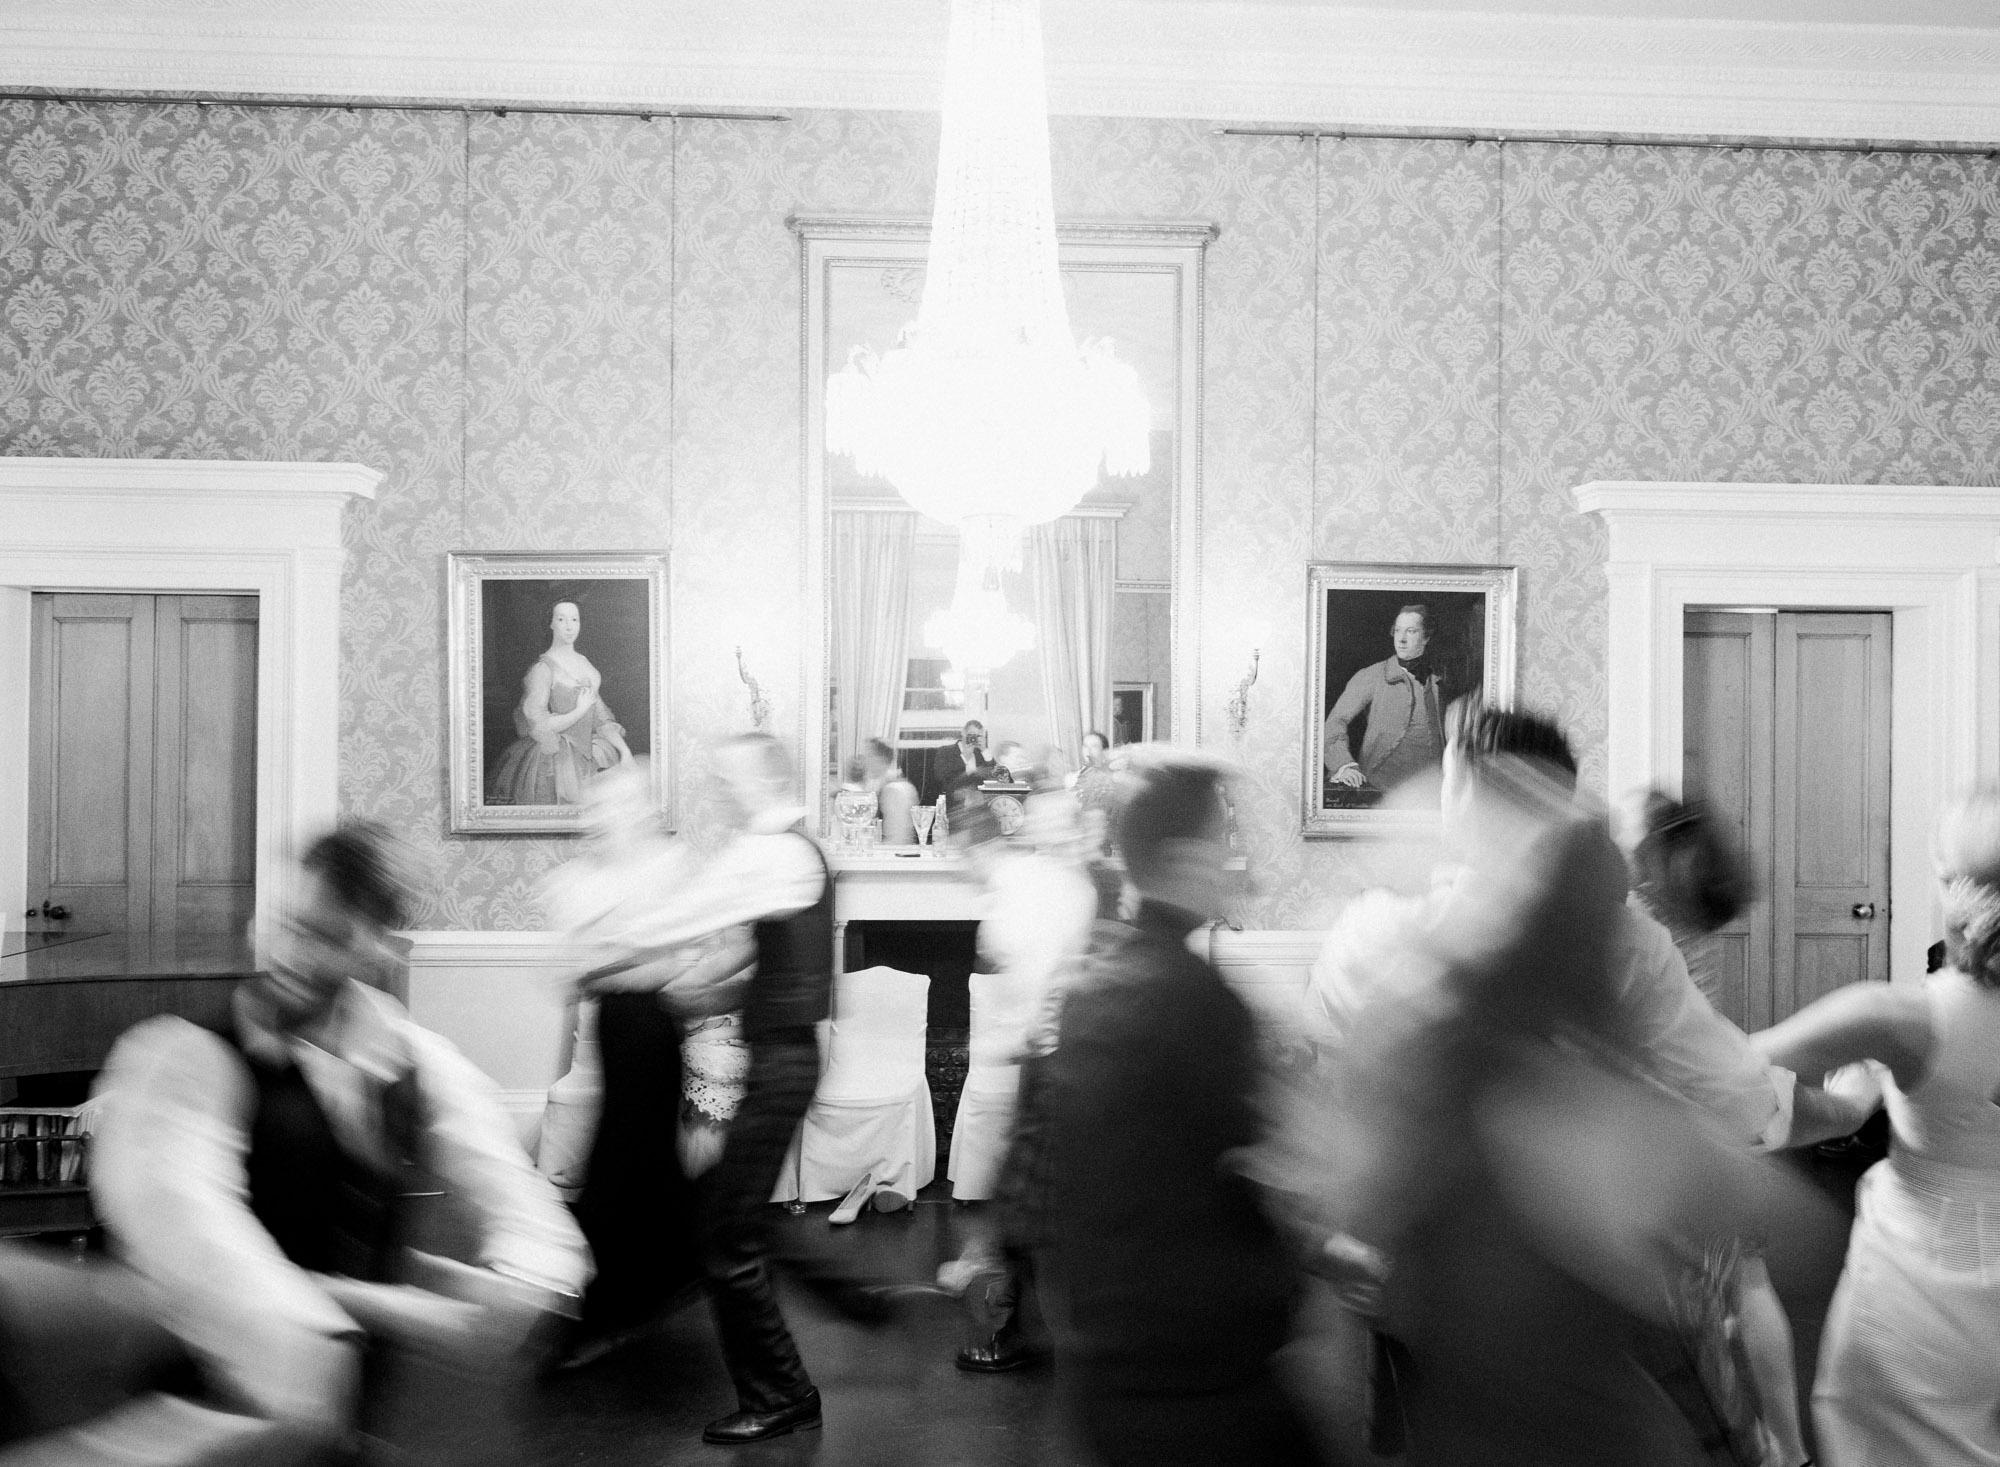 scottish_wedding_blairquhan_castle-109.jpg